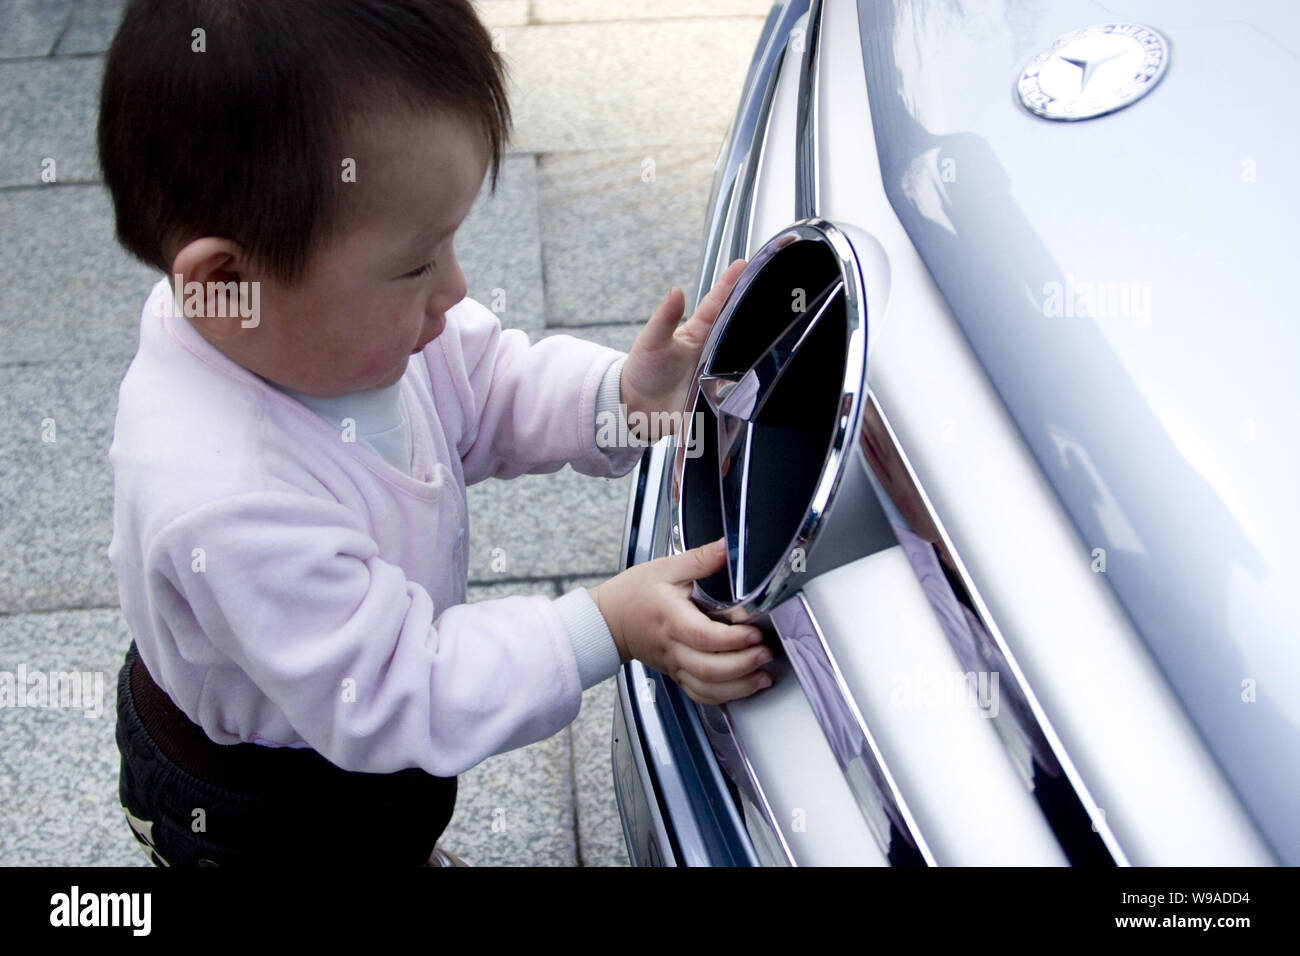 Baby Elegance Rear View Mirror